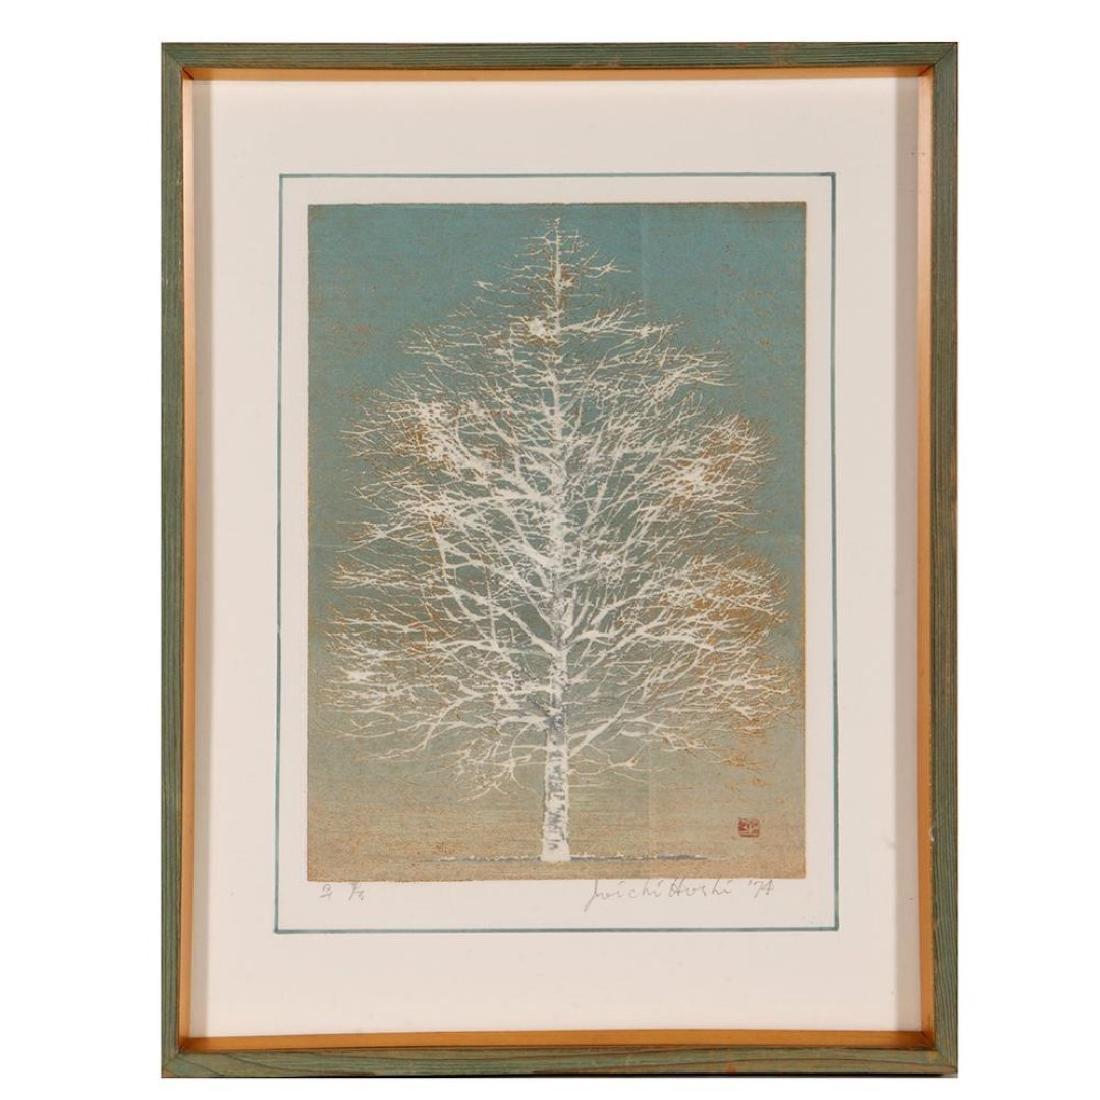 Japanese woodblock, JOICHI HOSHI